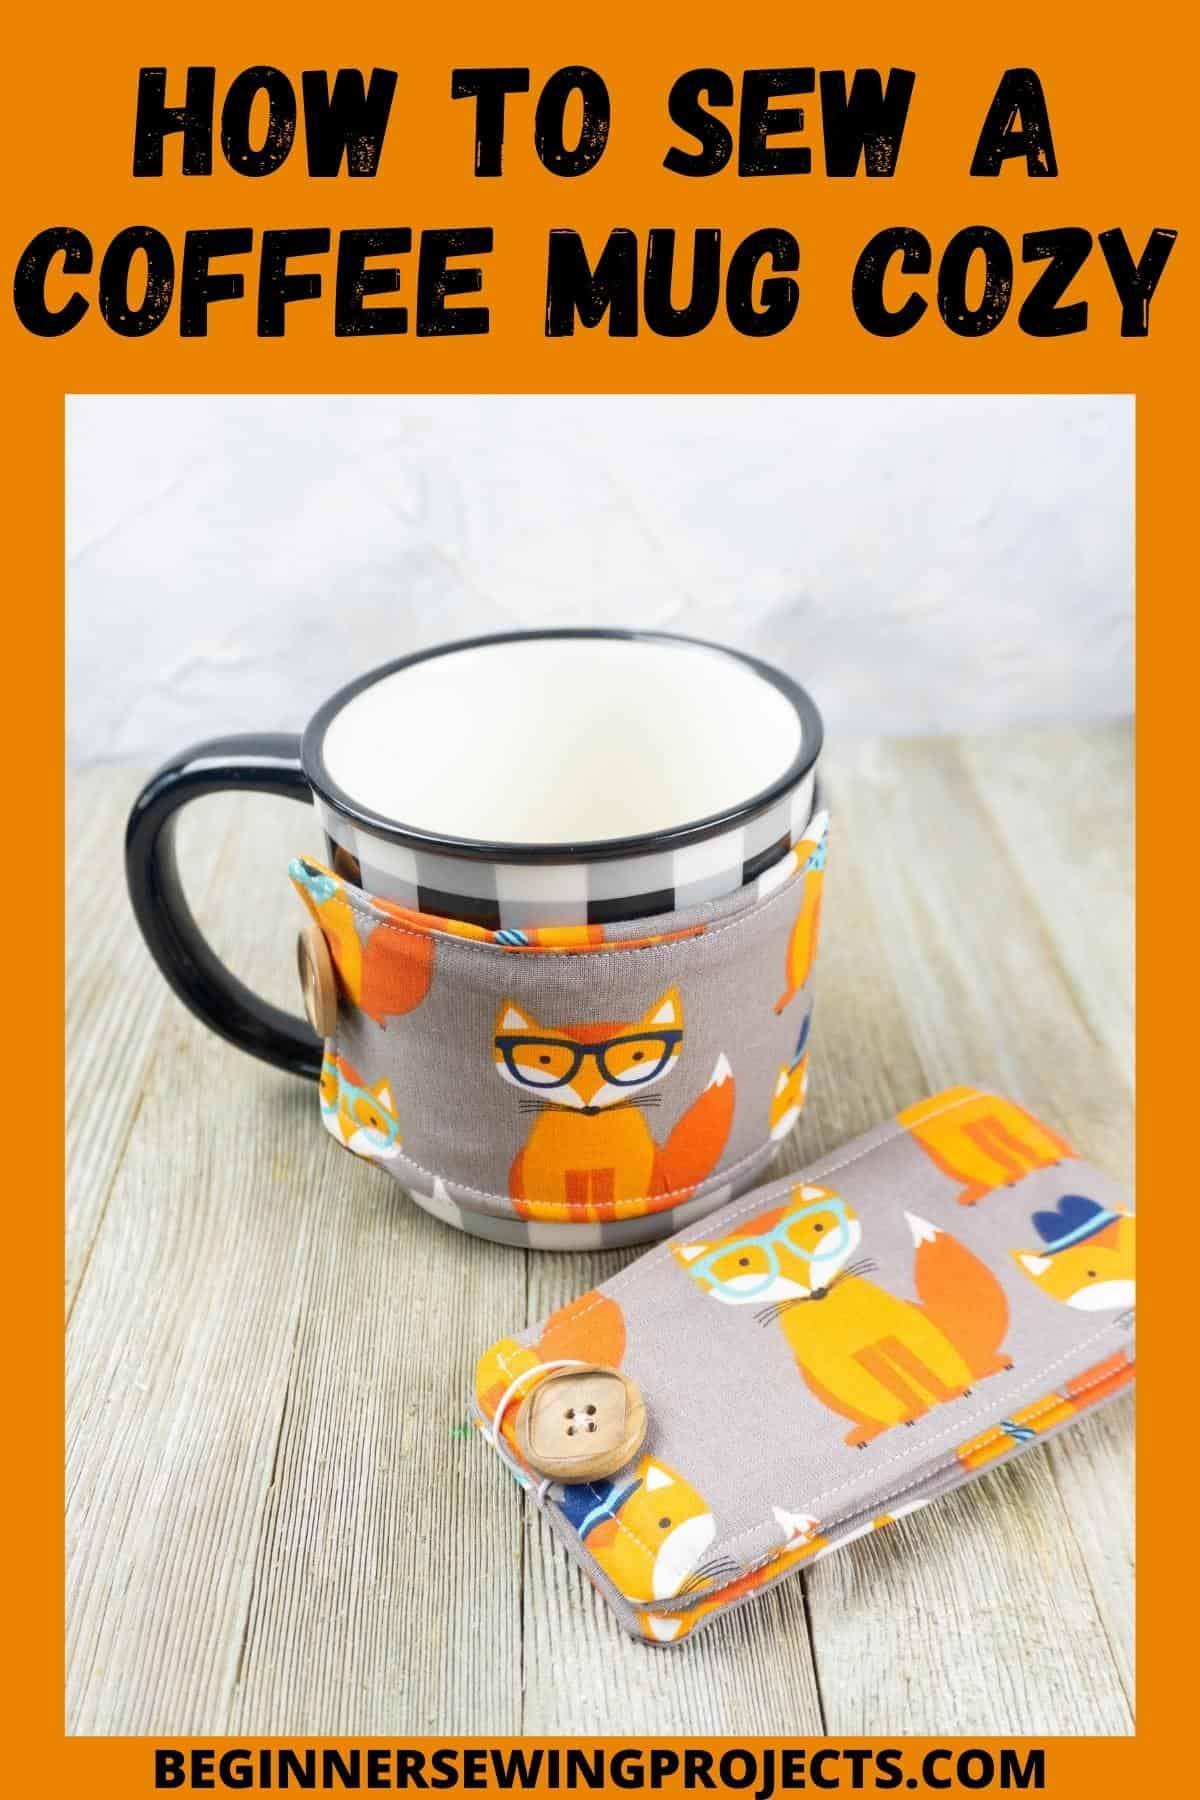 How To Sew A Coffee Mug Cozy